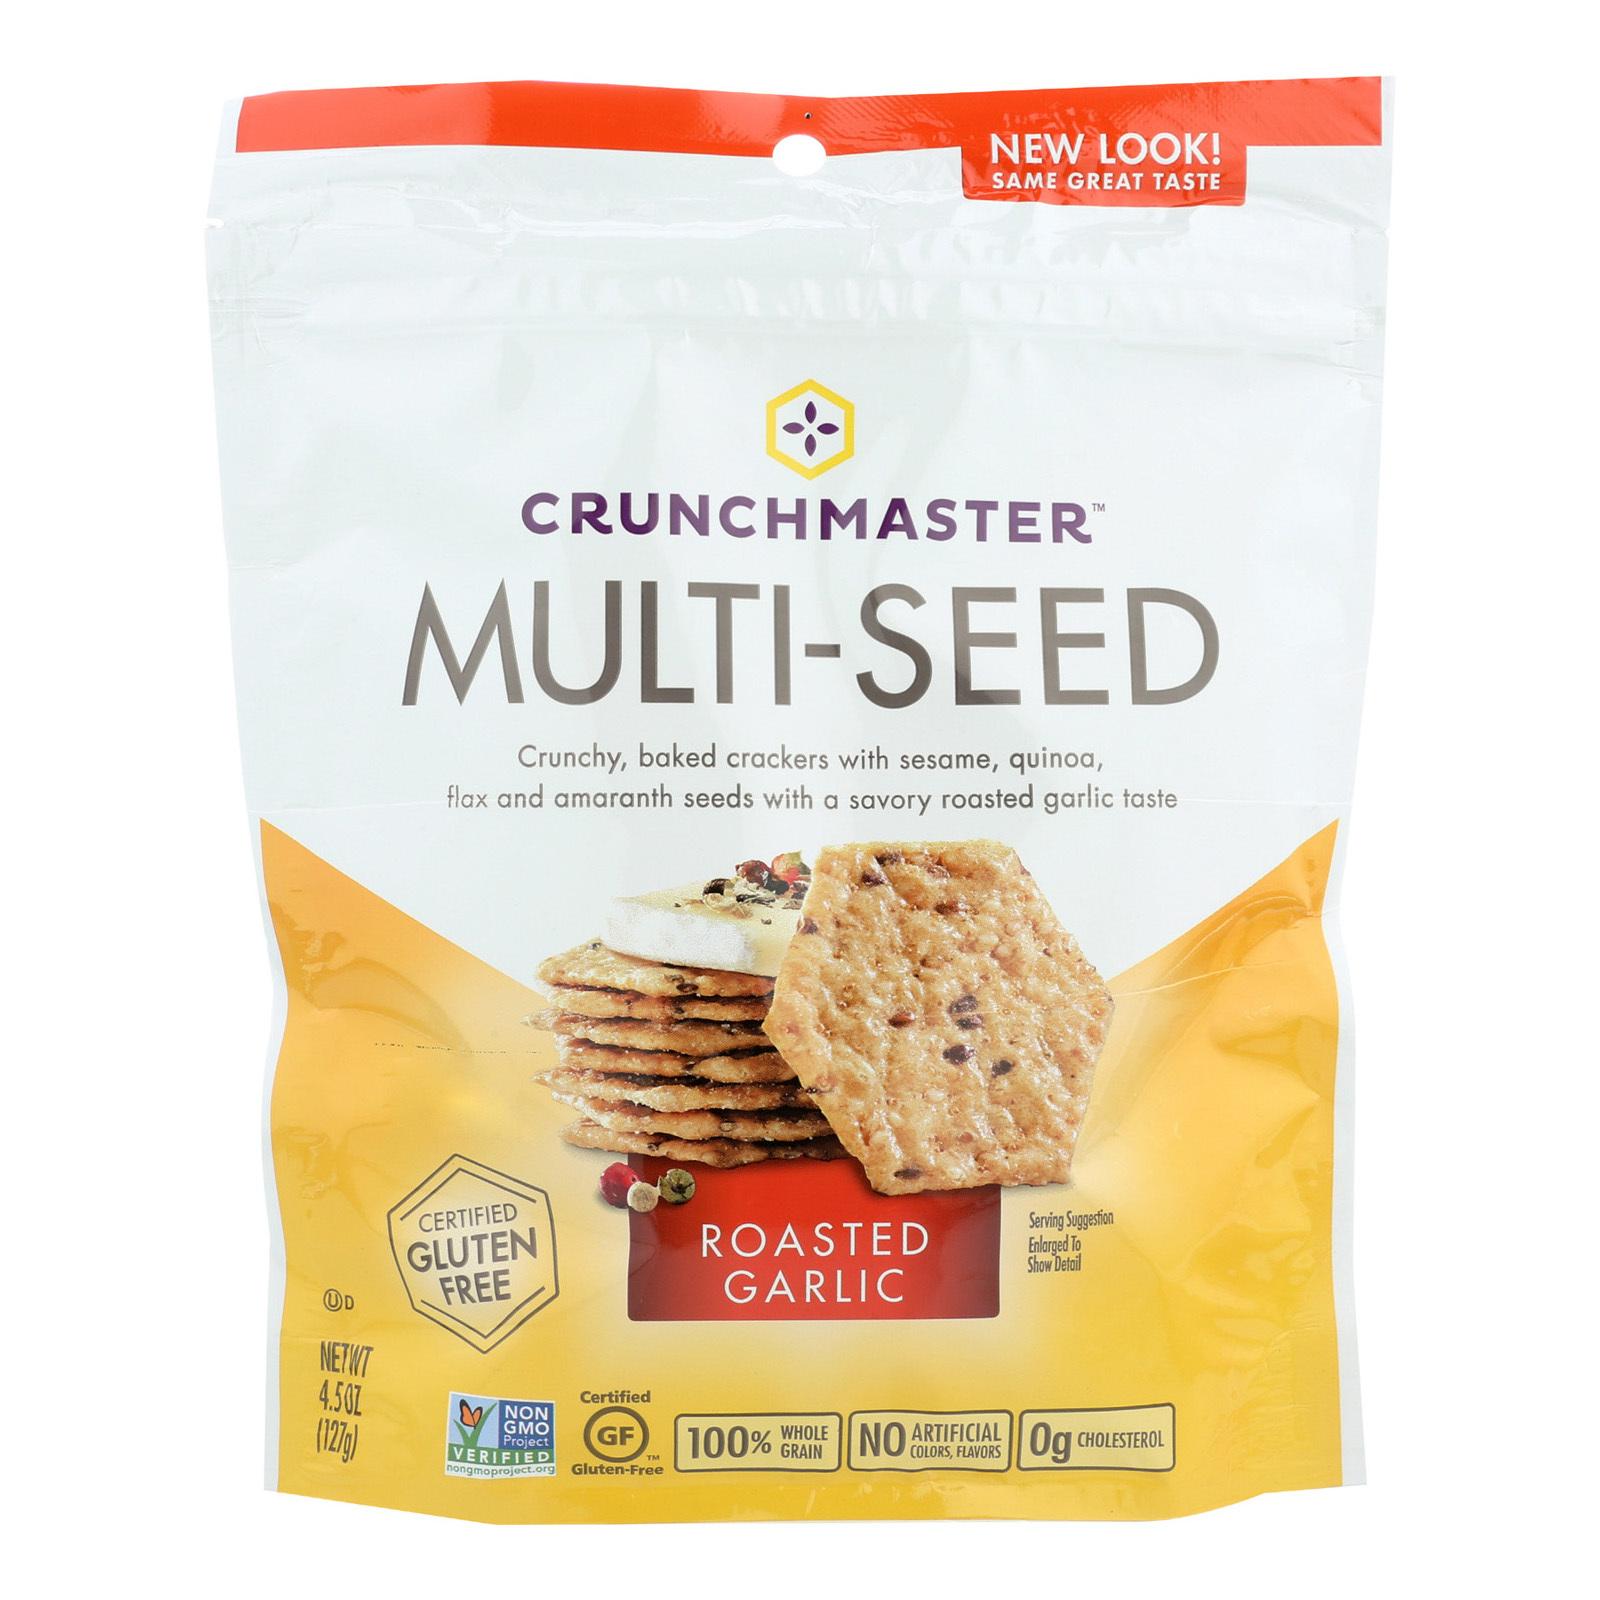 Crunchmaster Multi-Seed Crackers - Roasted Garlic - Case of 12 - 4.5 oz.